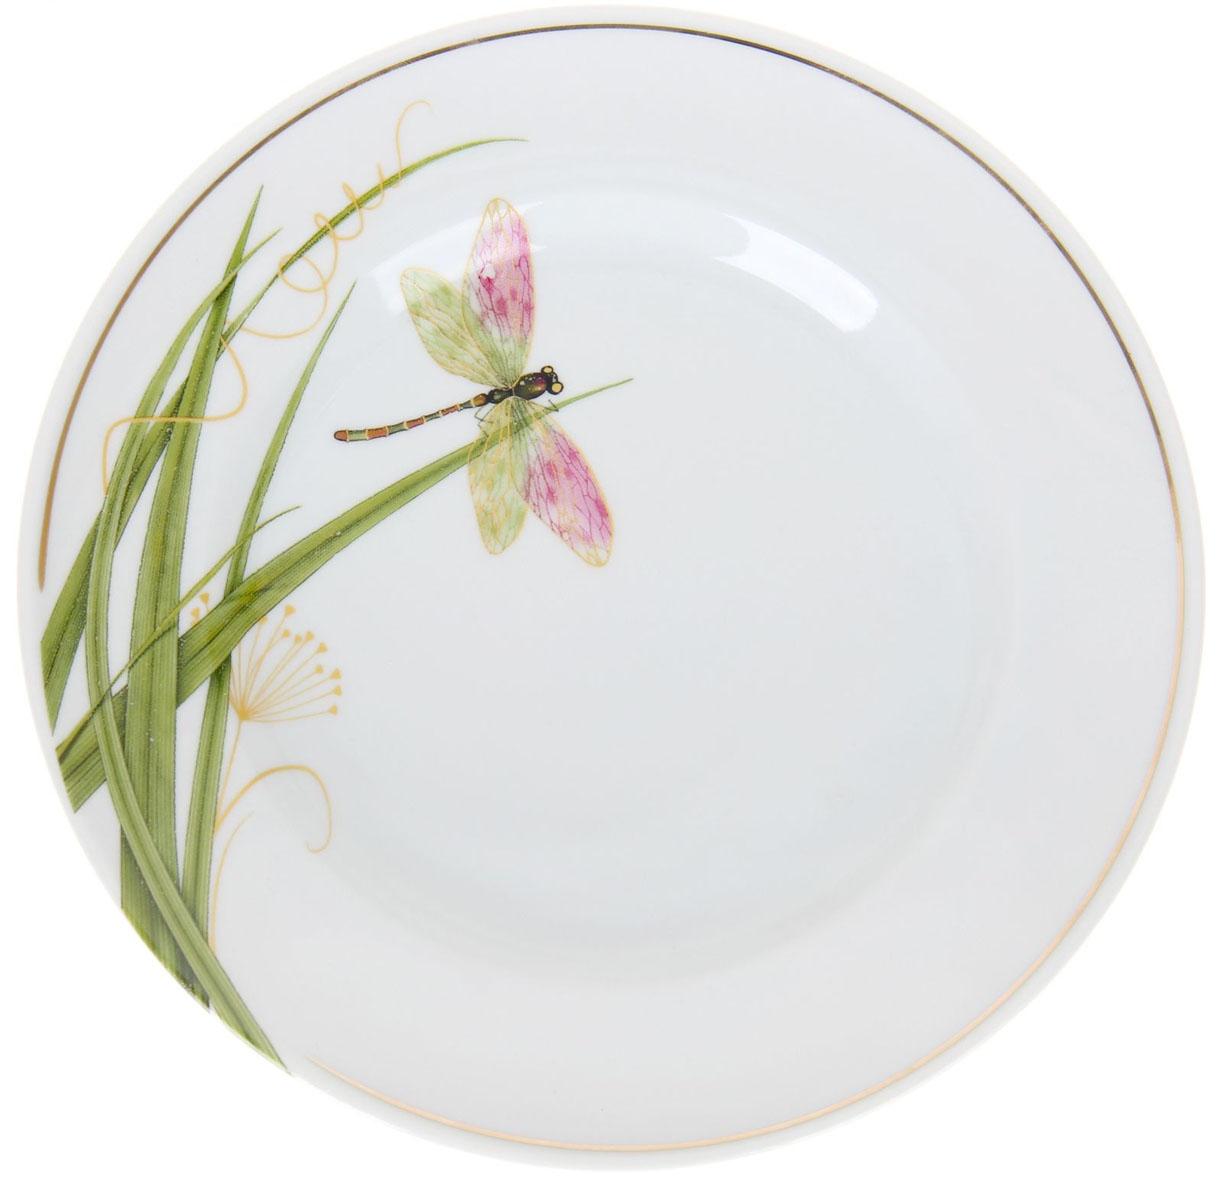 Тарелка мелкая Идиллия. Стрекоза, диаметр 20 см1225769